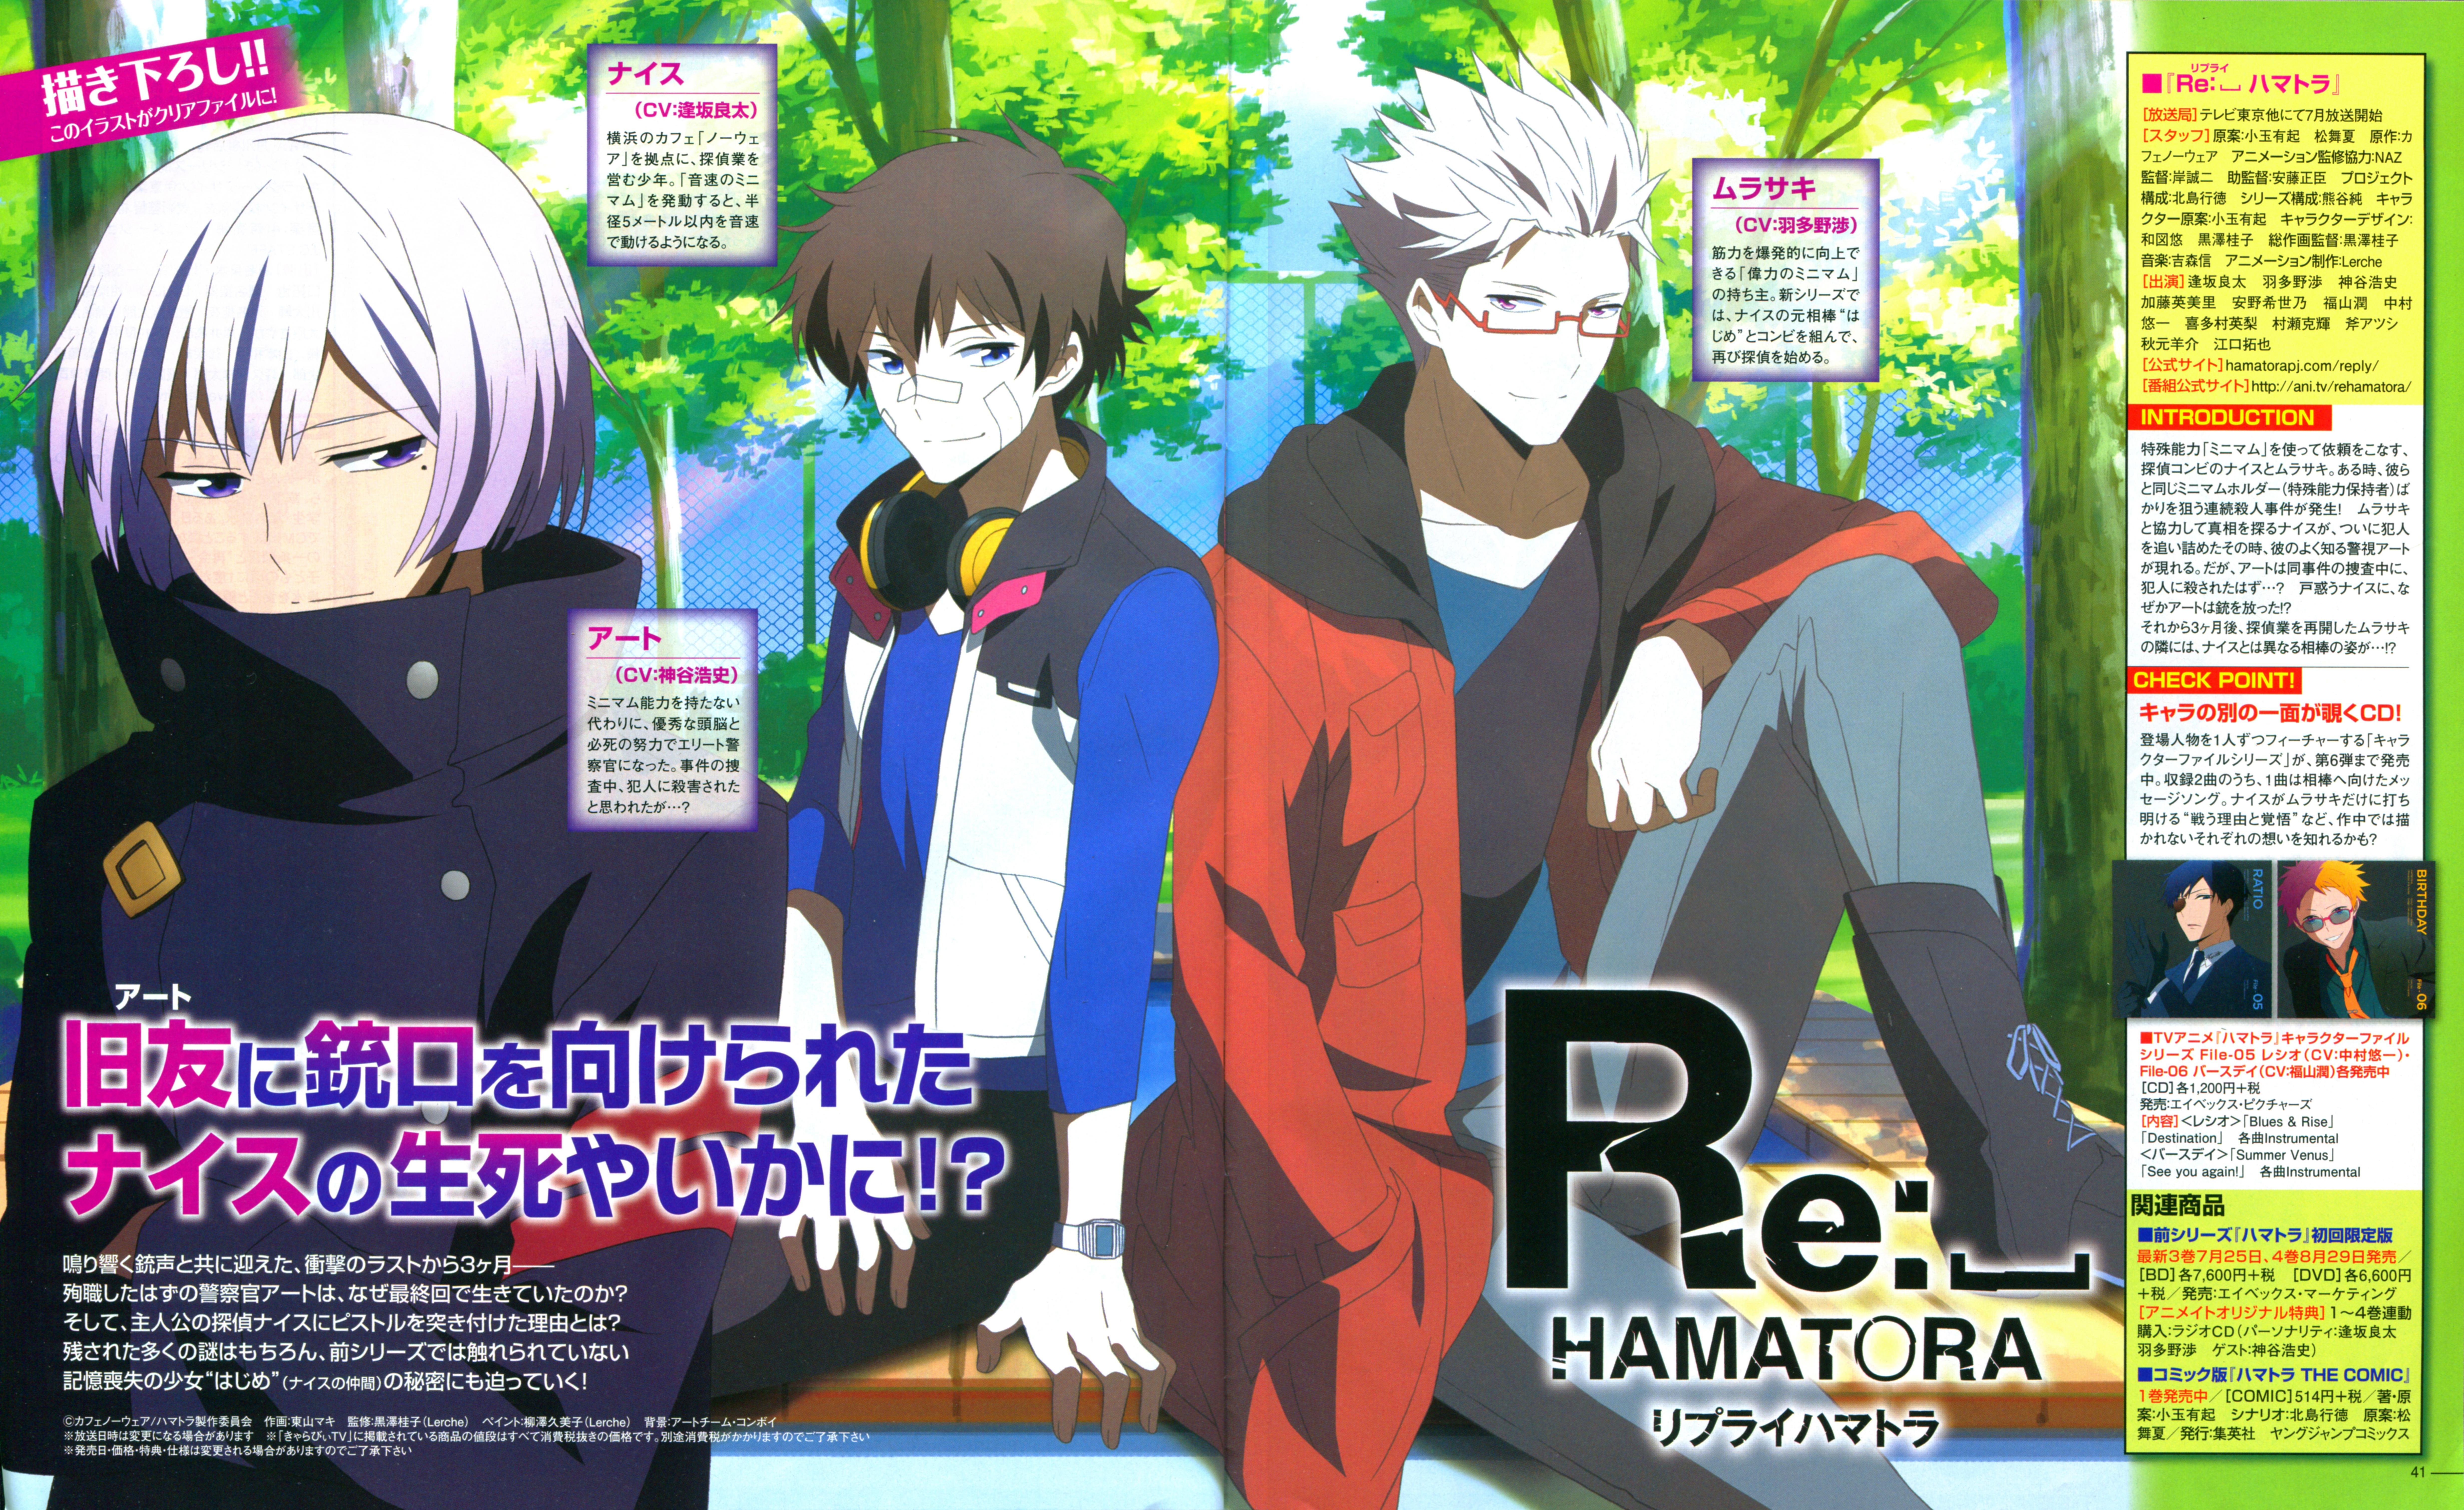 Hamatora Wallpaper 1766173 Zerochan Anime Image Board